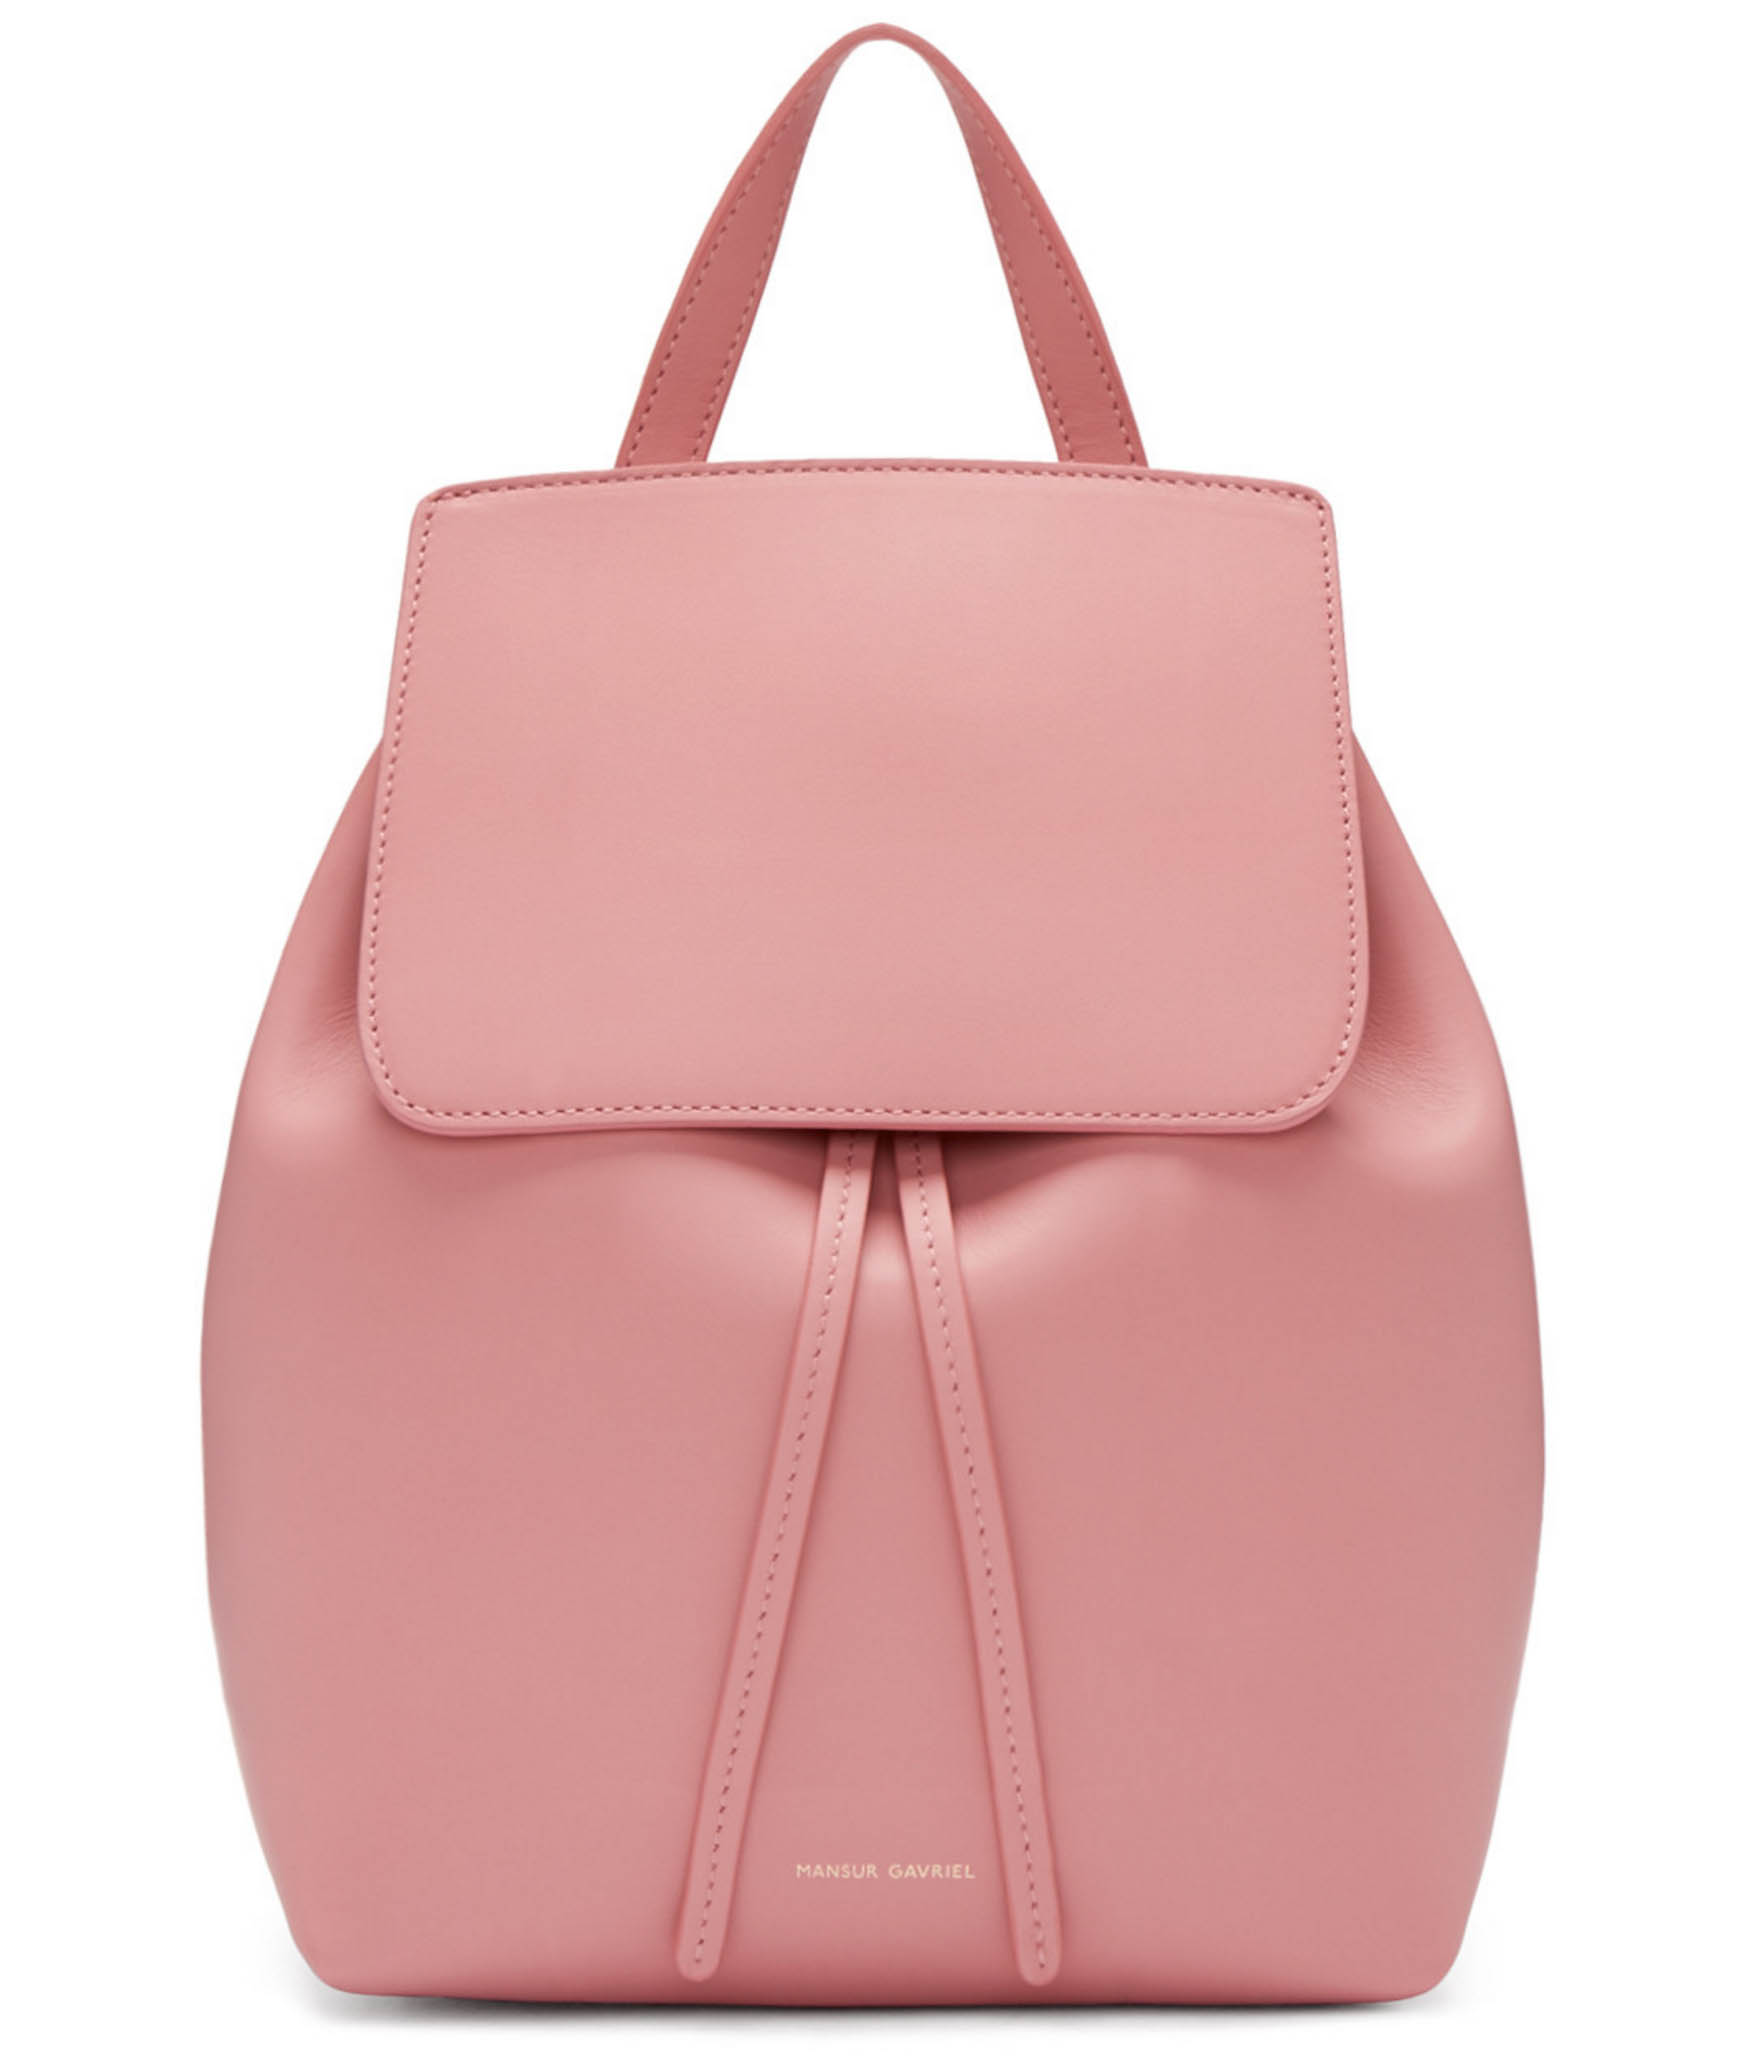 CDFA pink